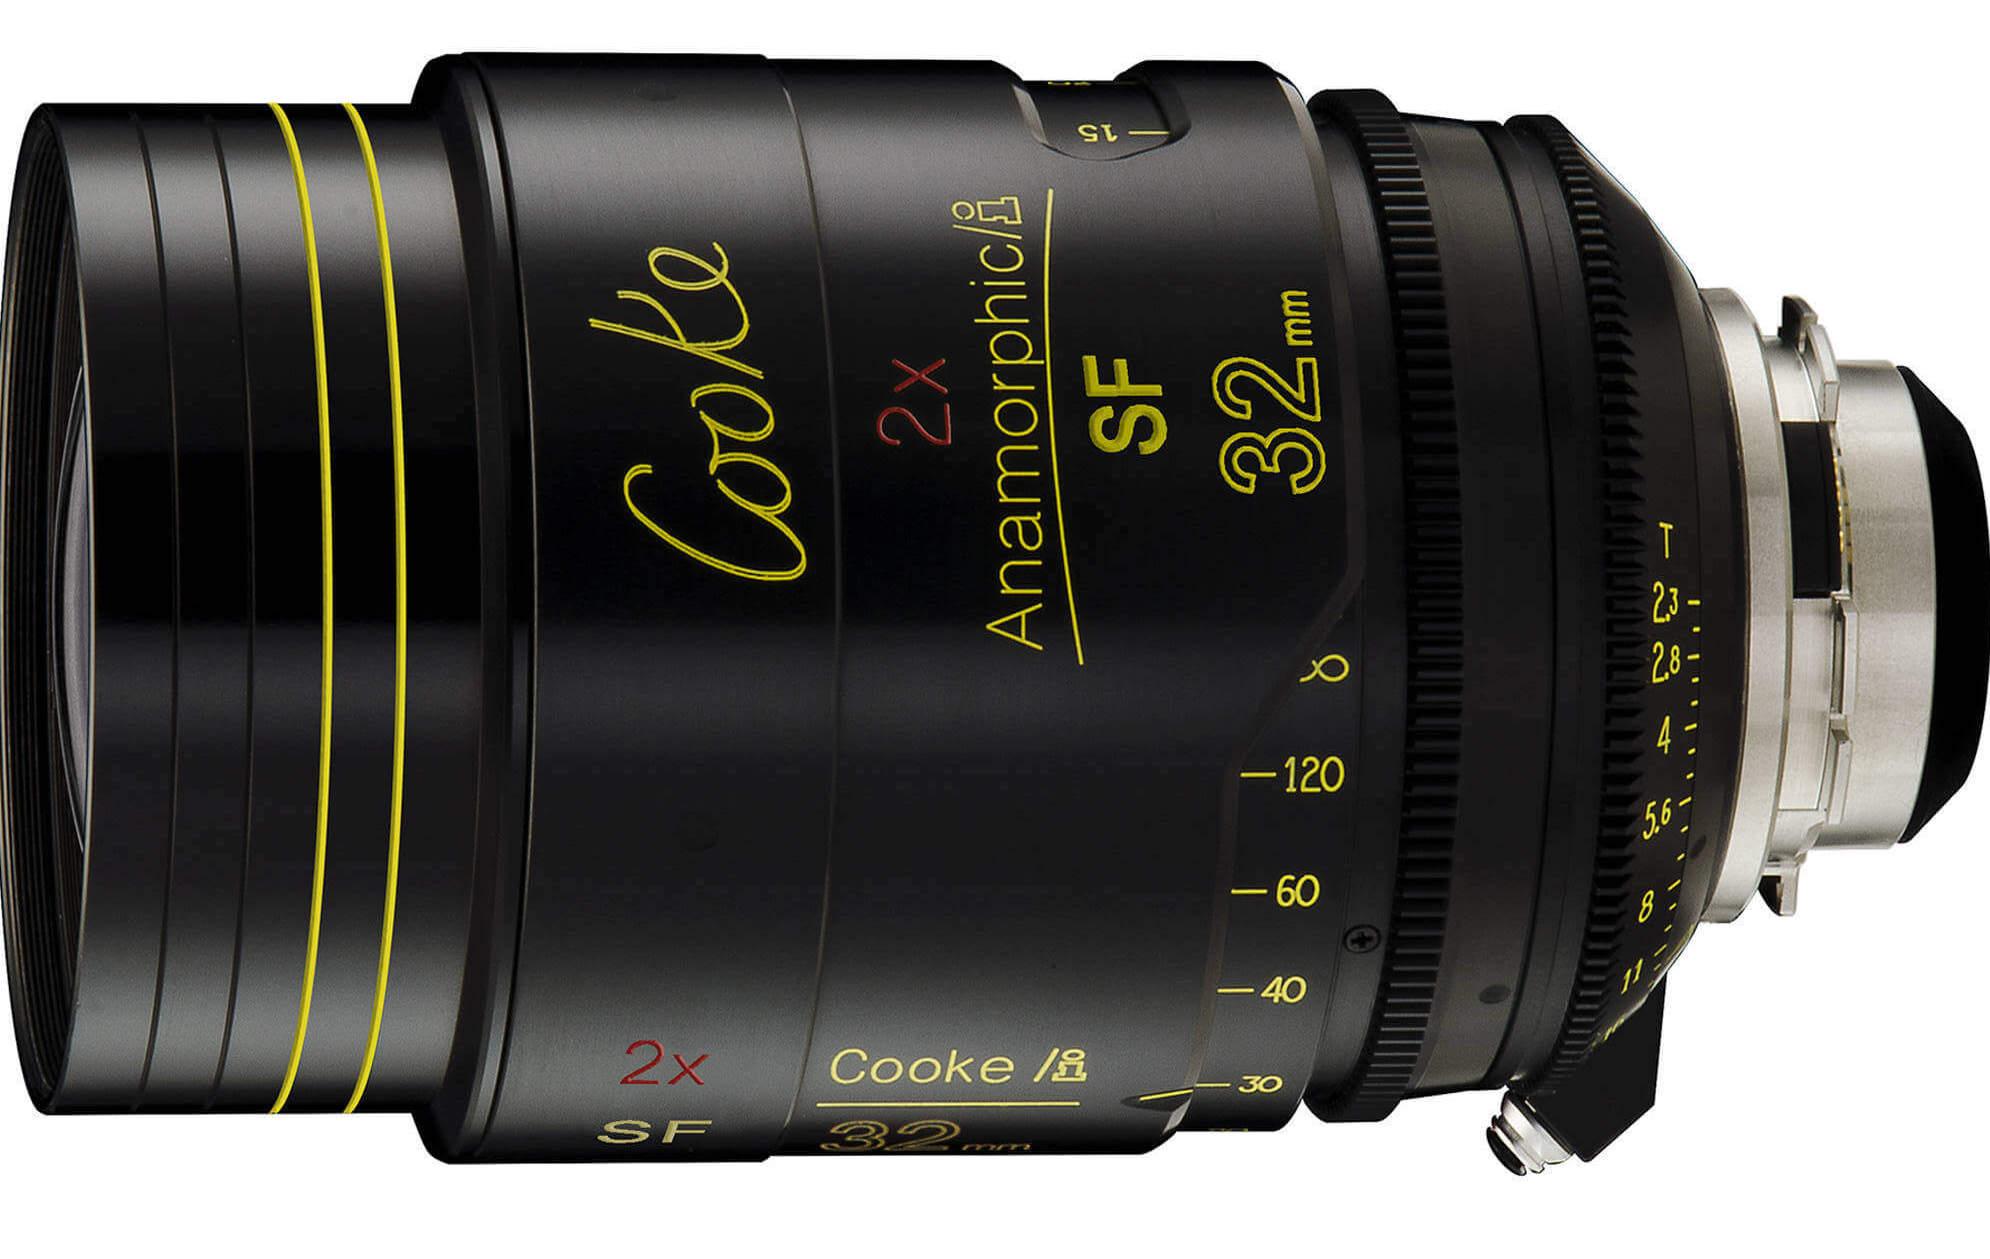 Cooke Anamorphic SF 2x lens 32mm